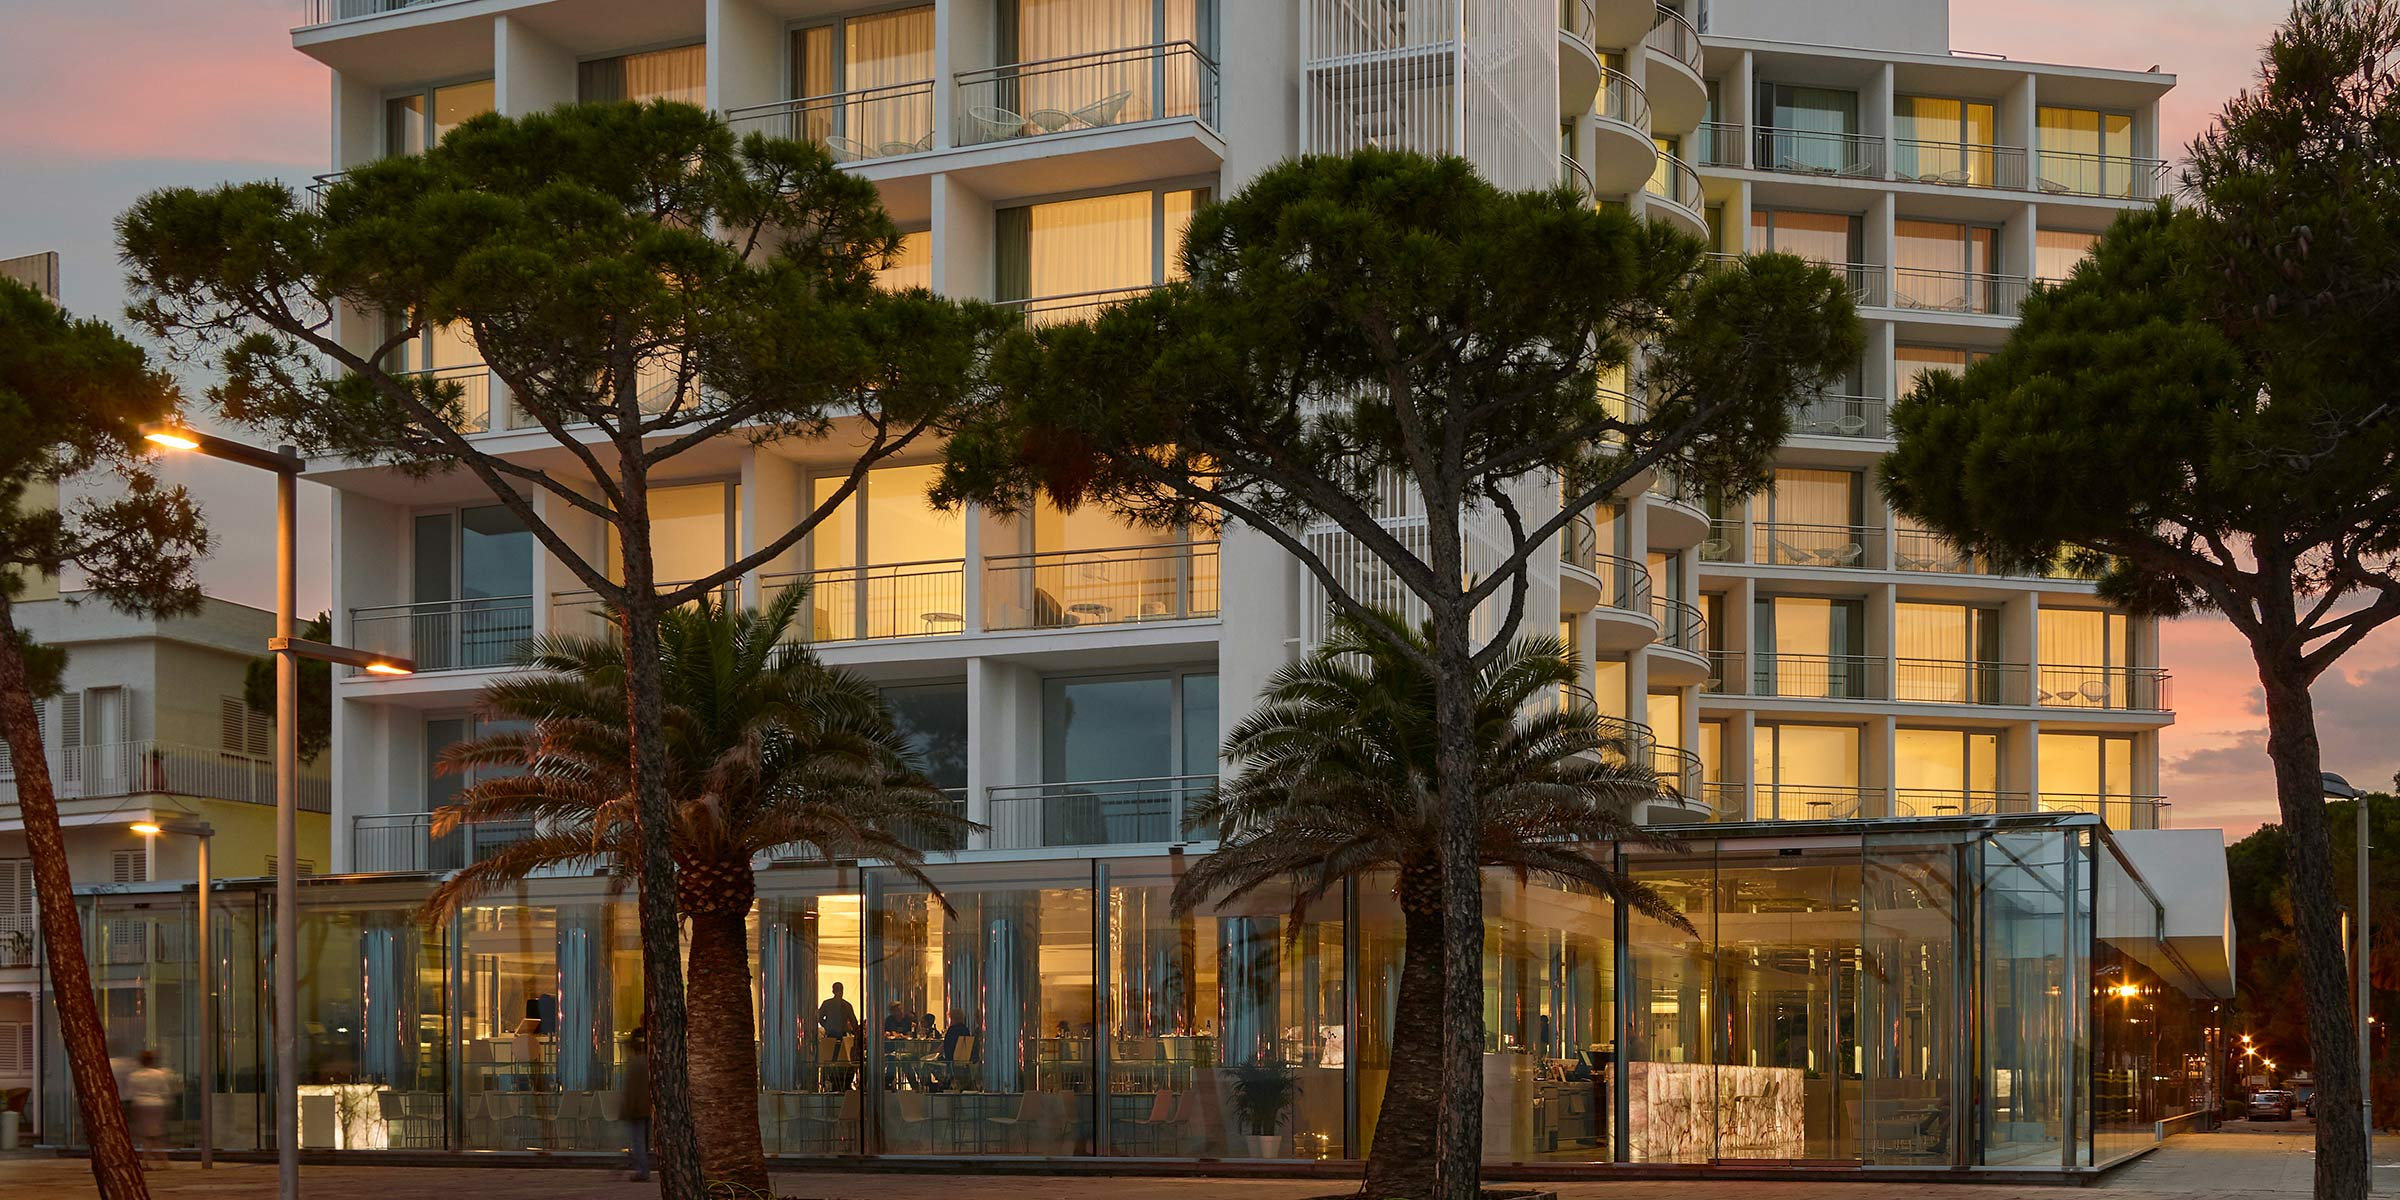 Ventanas-aluminio-calidad-Thermia-Barcelona-AR62_hotelAromar